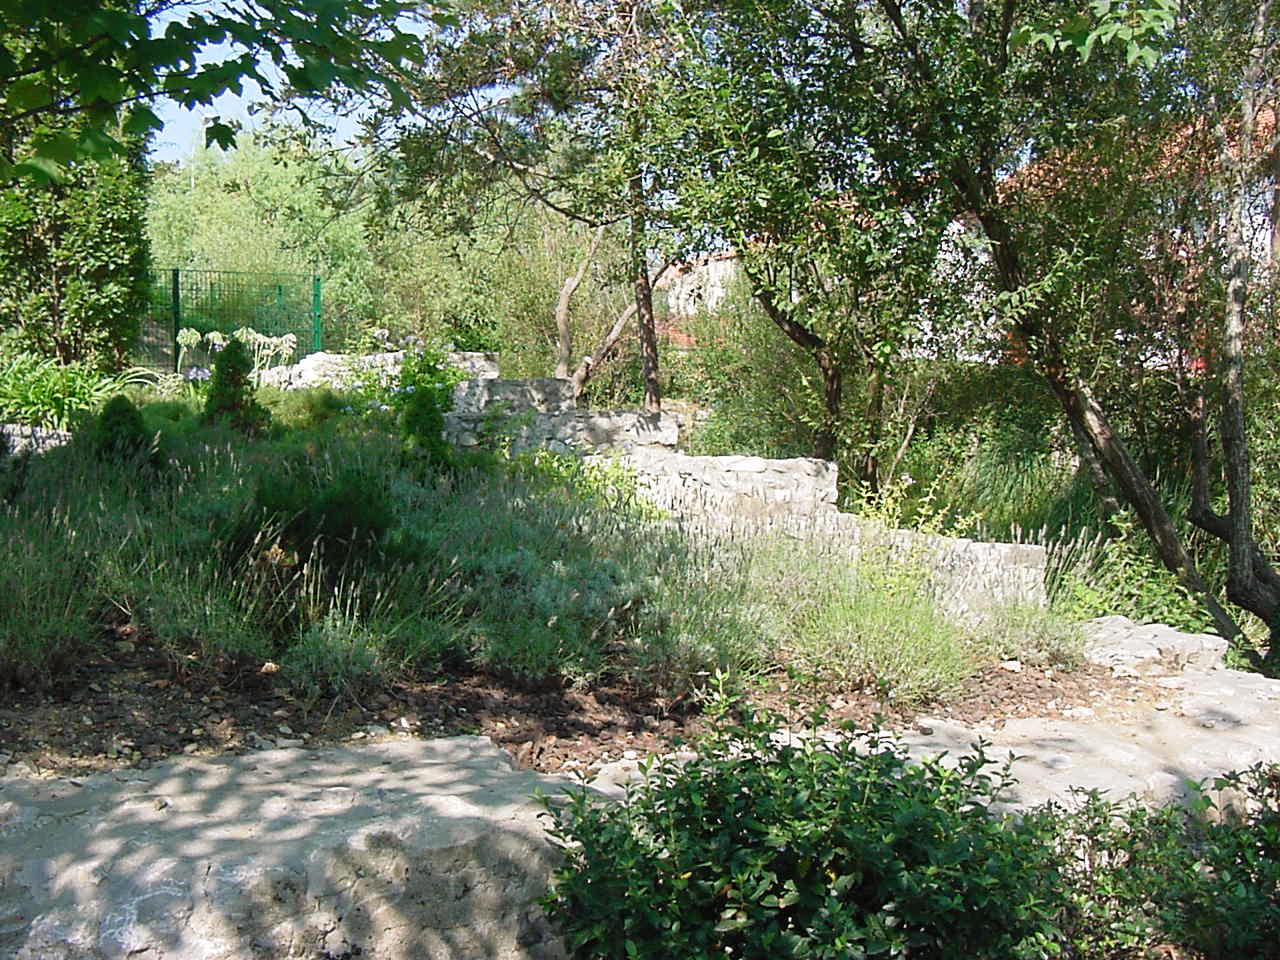 Jardin de ville_Lahouze 08